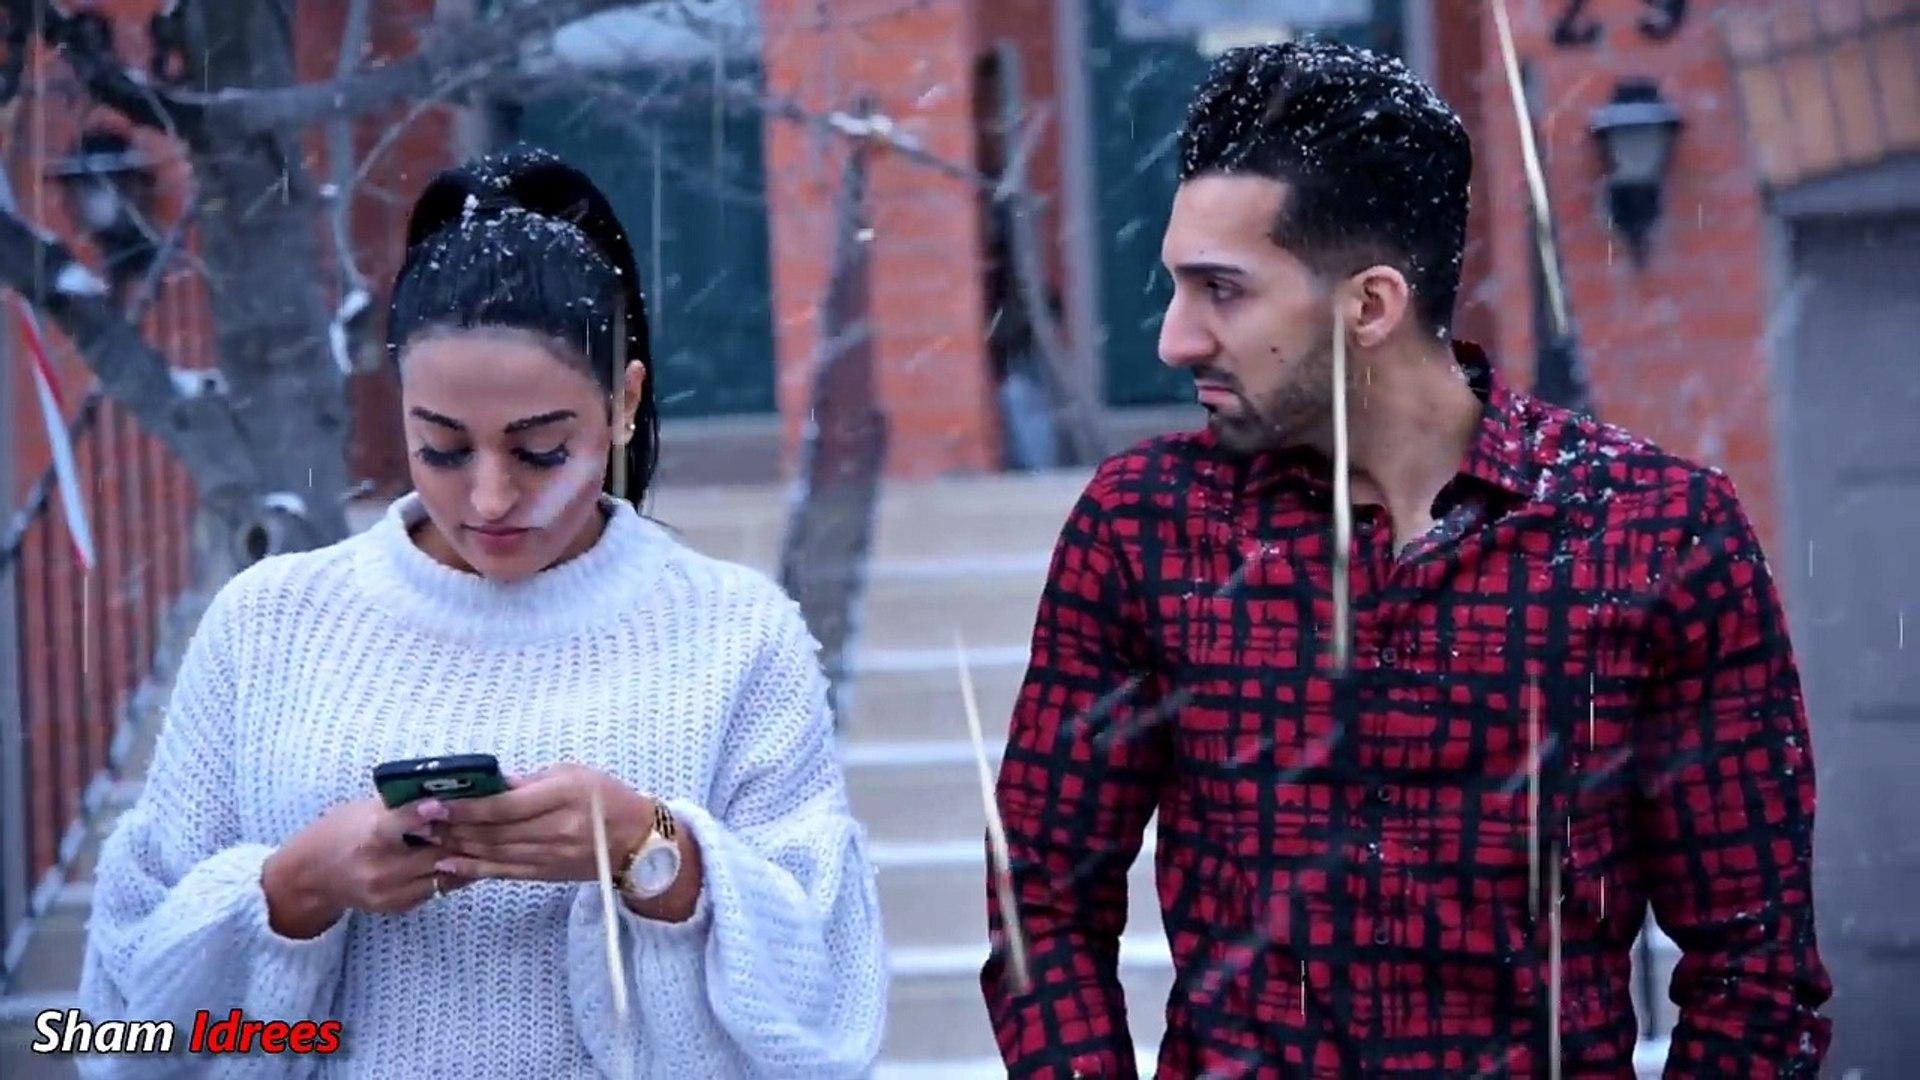 Types Of Girlfriends Sham Idrees Video Dailymotion